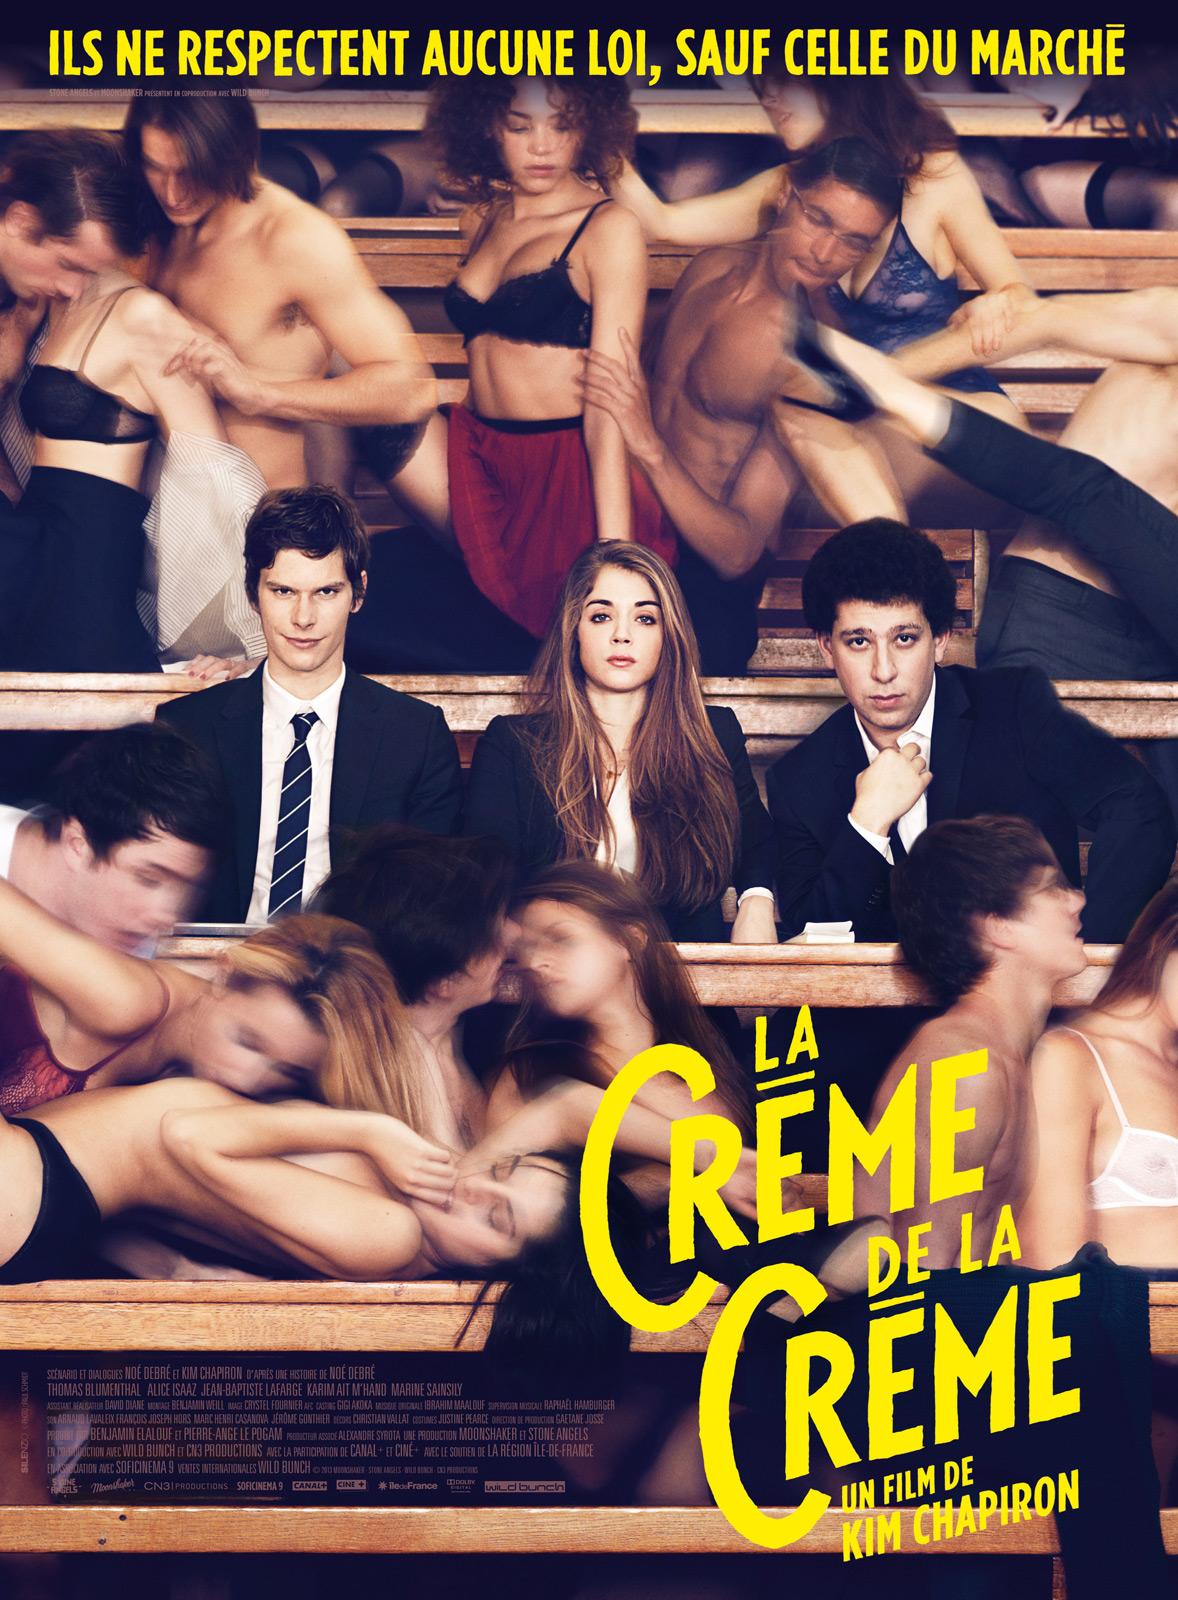 La Crème de la Crème streaming film